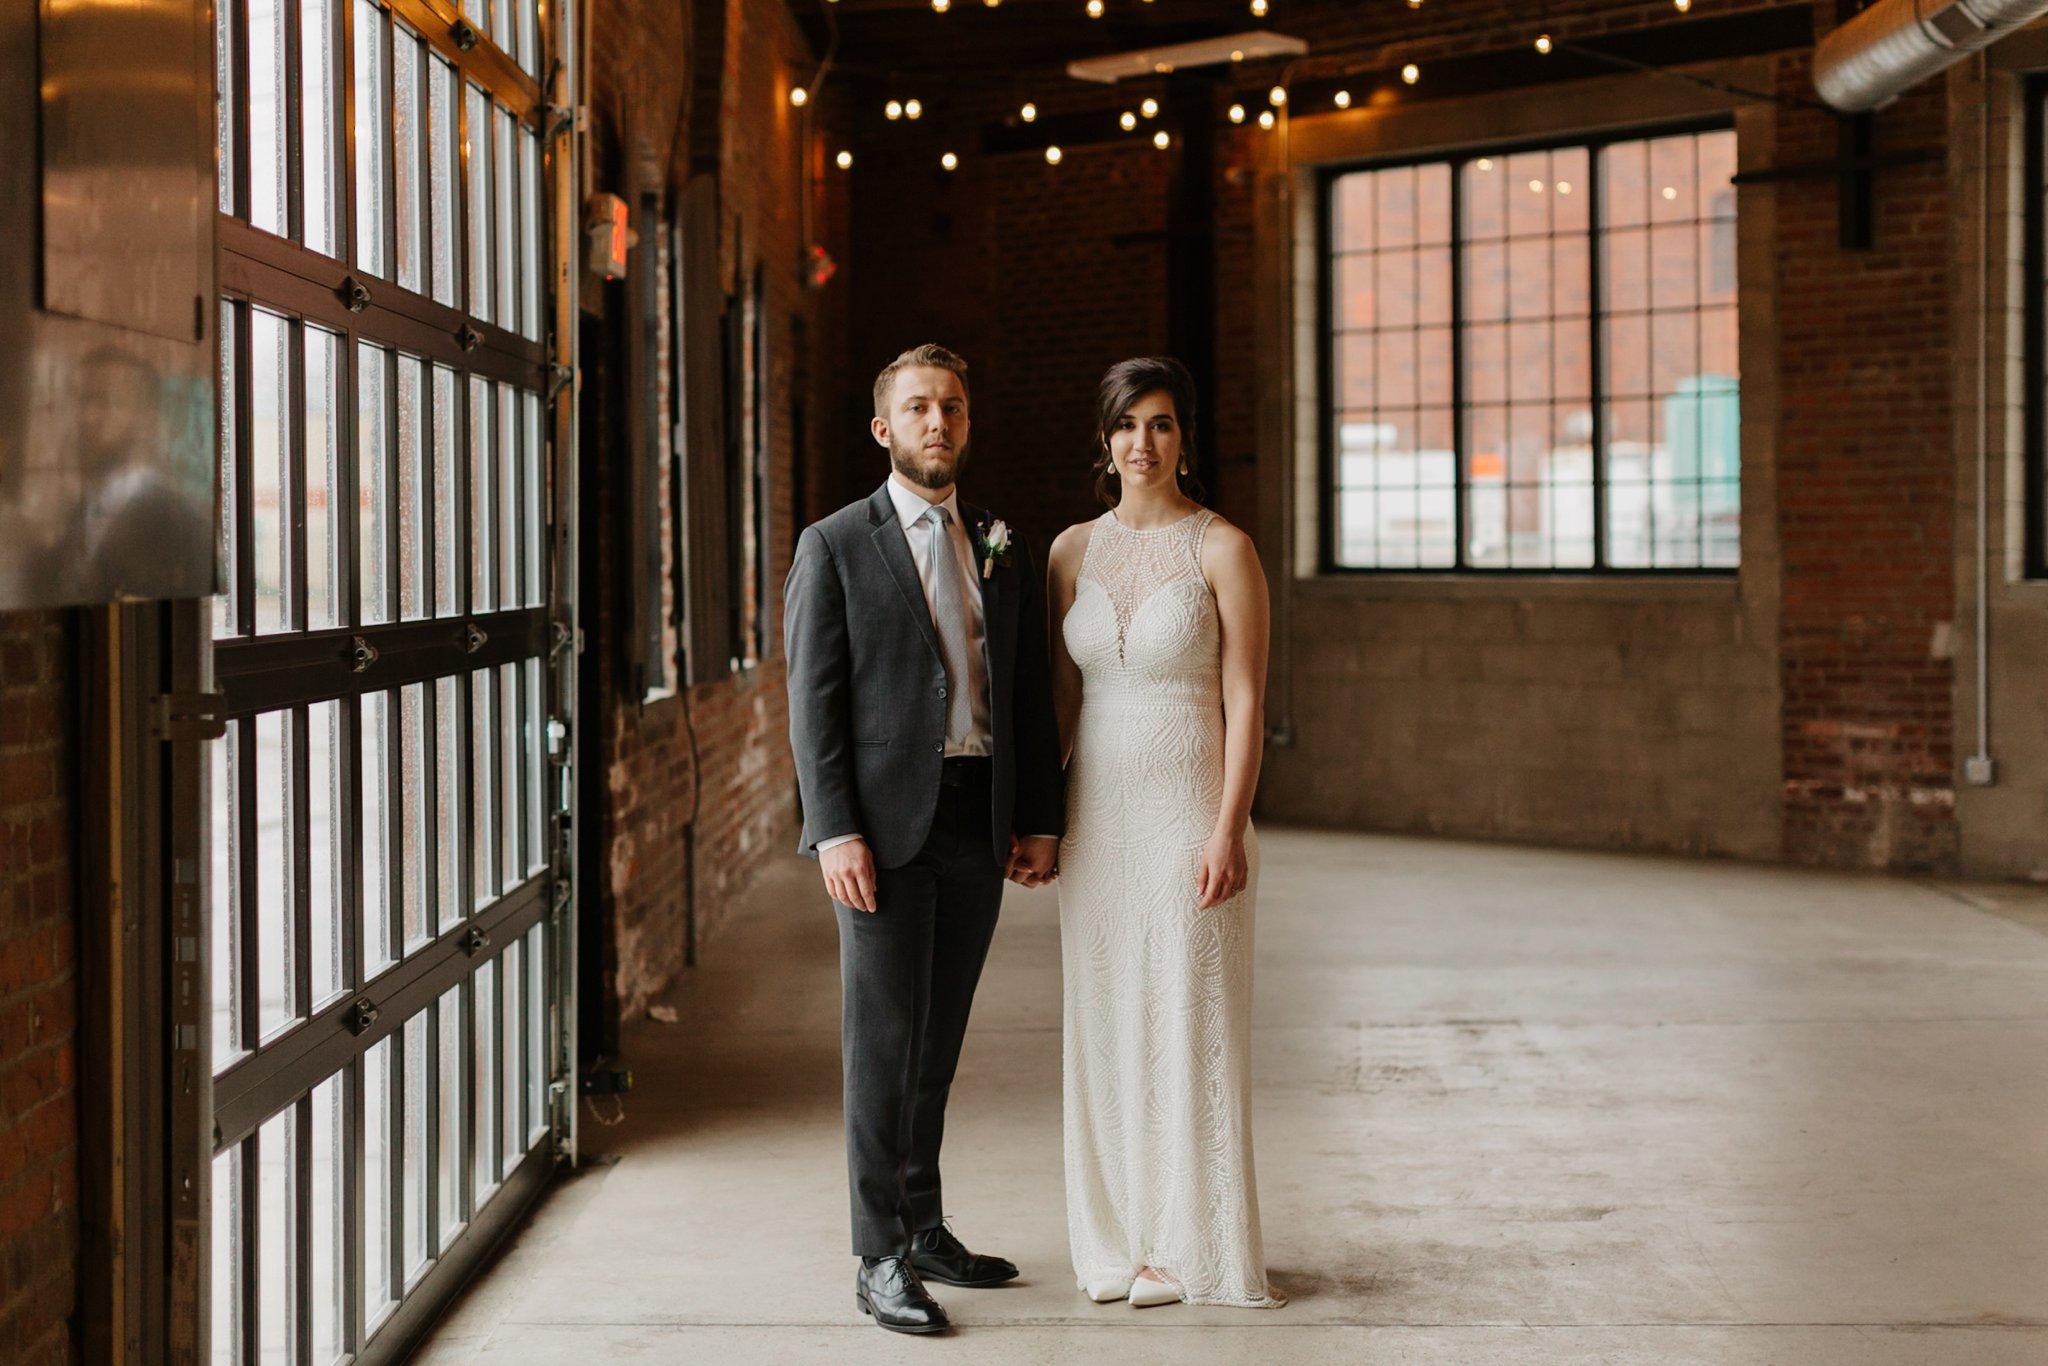 19-03-09 Katie and Josh Wedding Previews-50_WEB.jpg